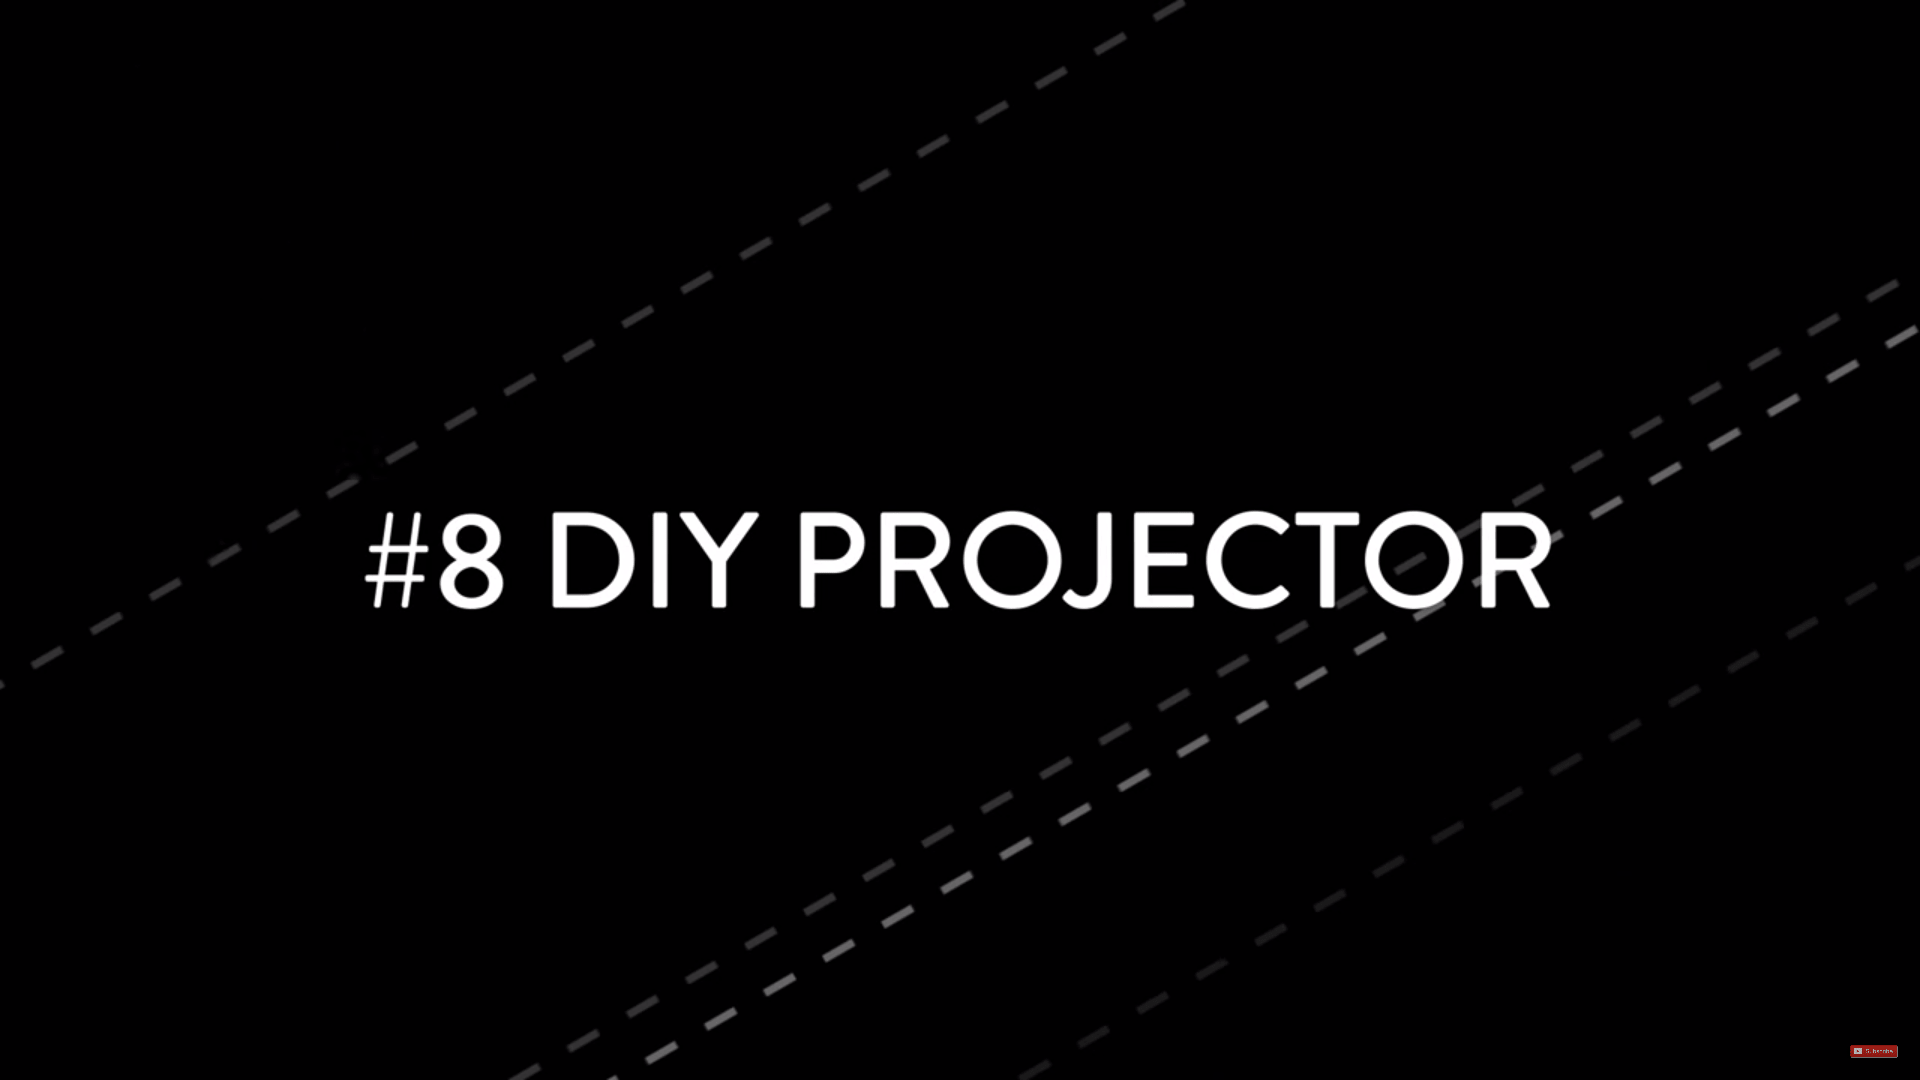 diyprojector min